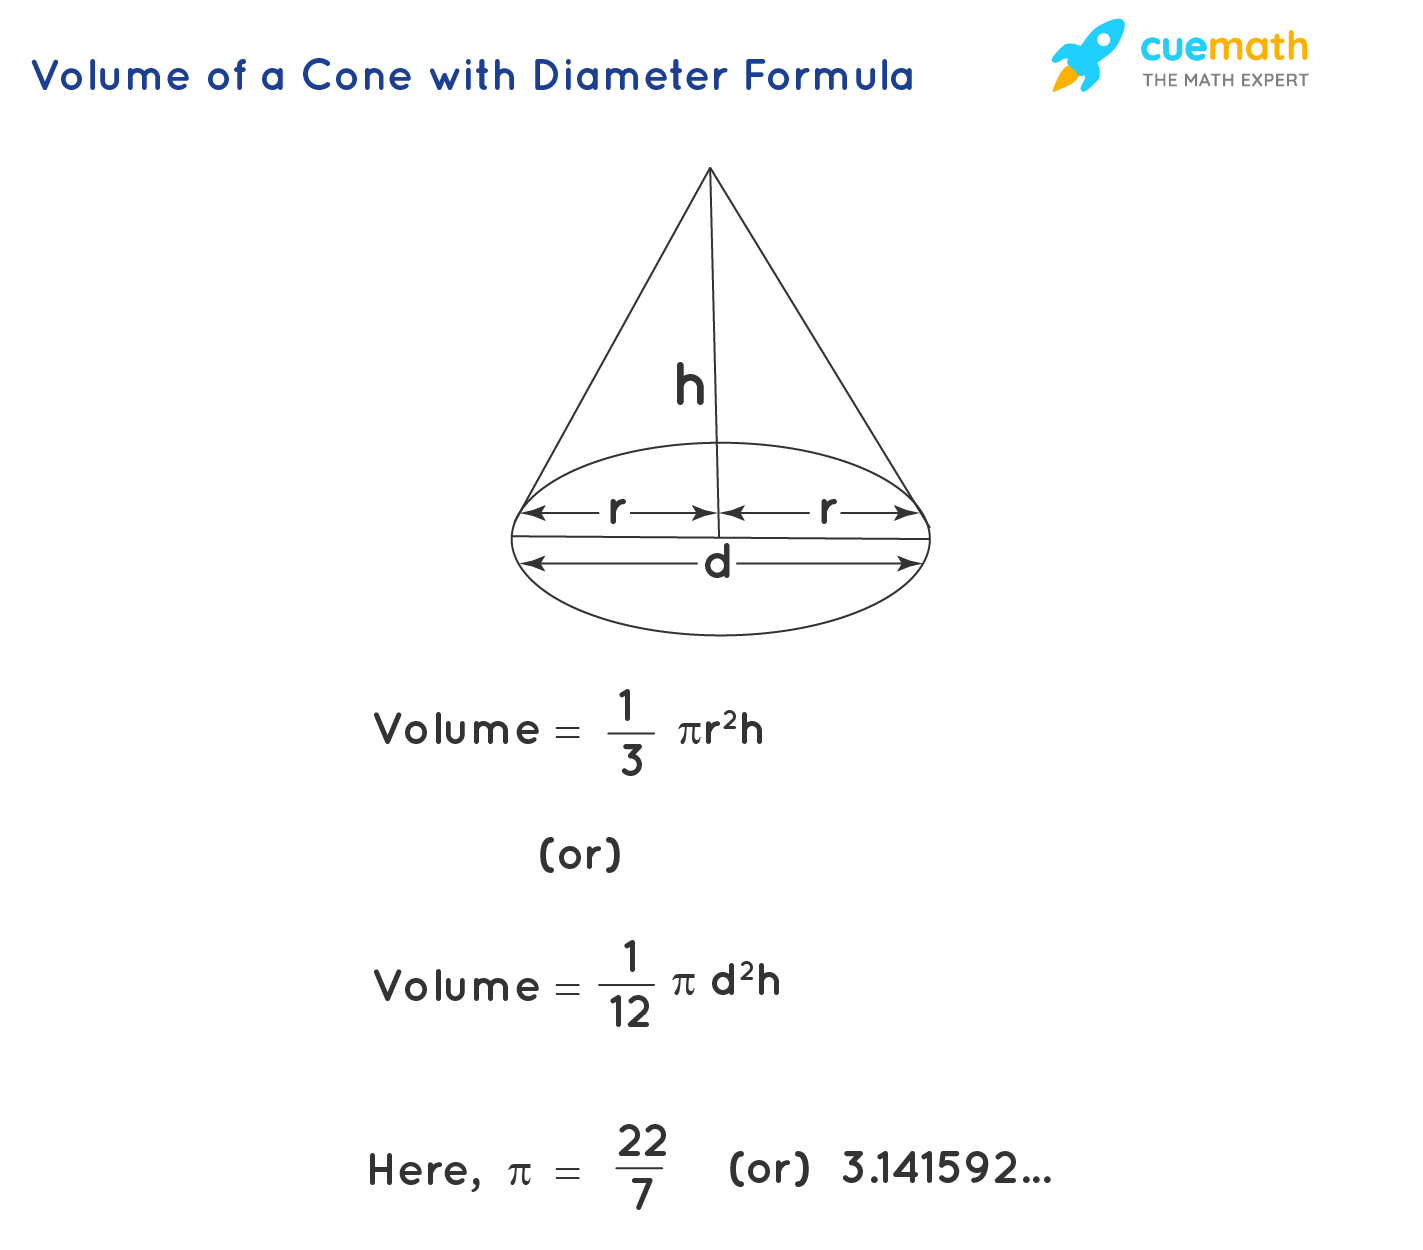 volume of a cone with diameter formulas